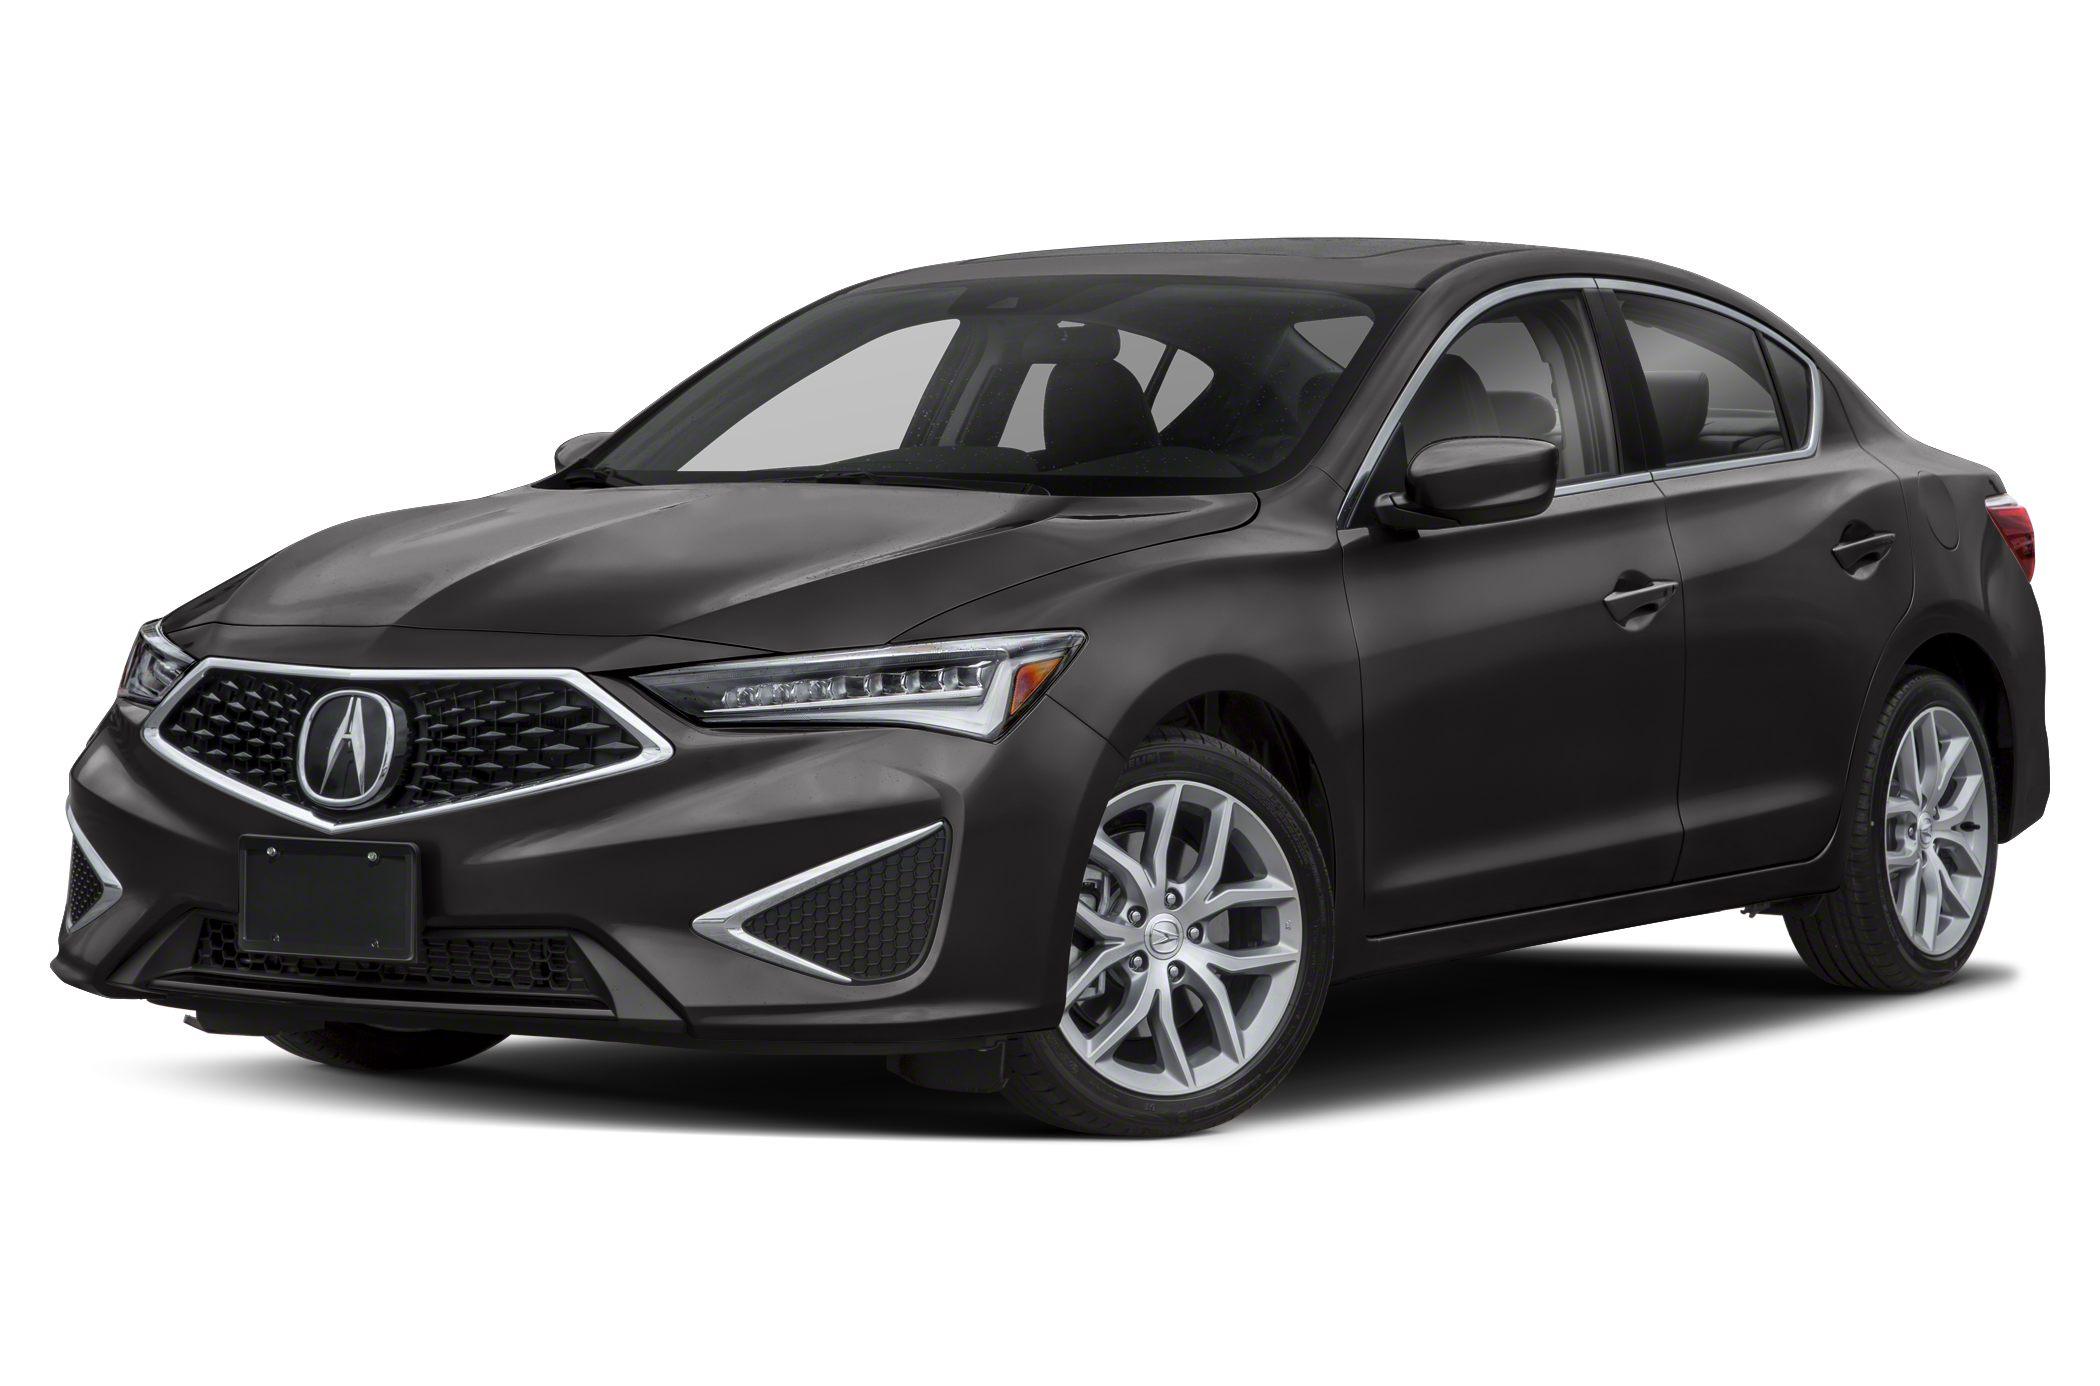 2019 Acura ILX Base 4dr Sedan